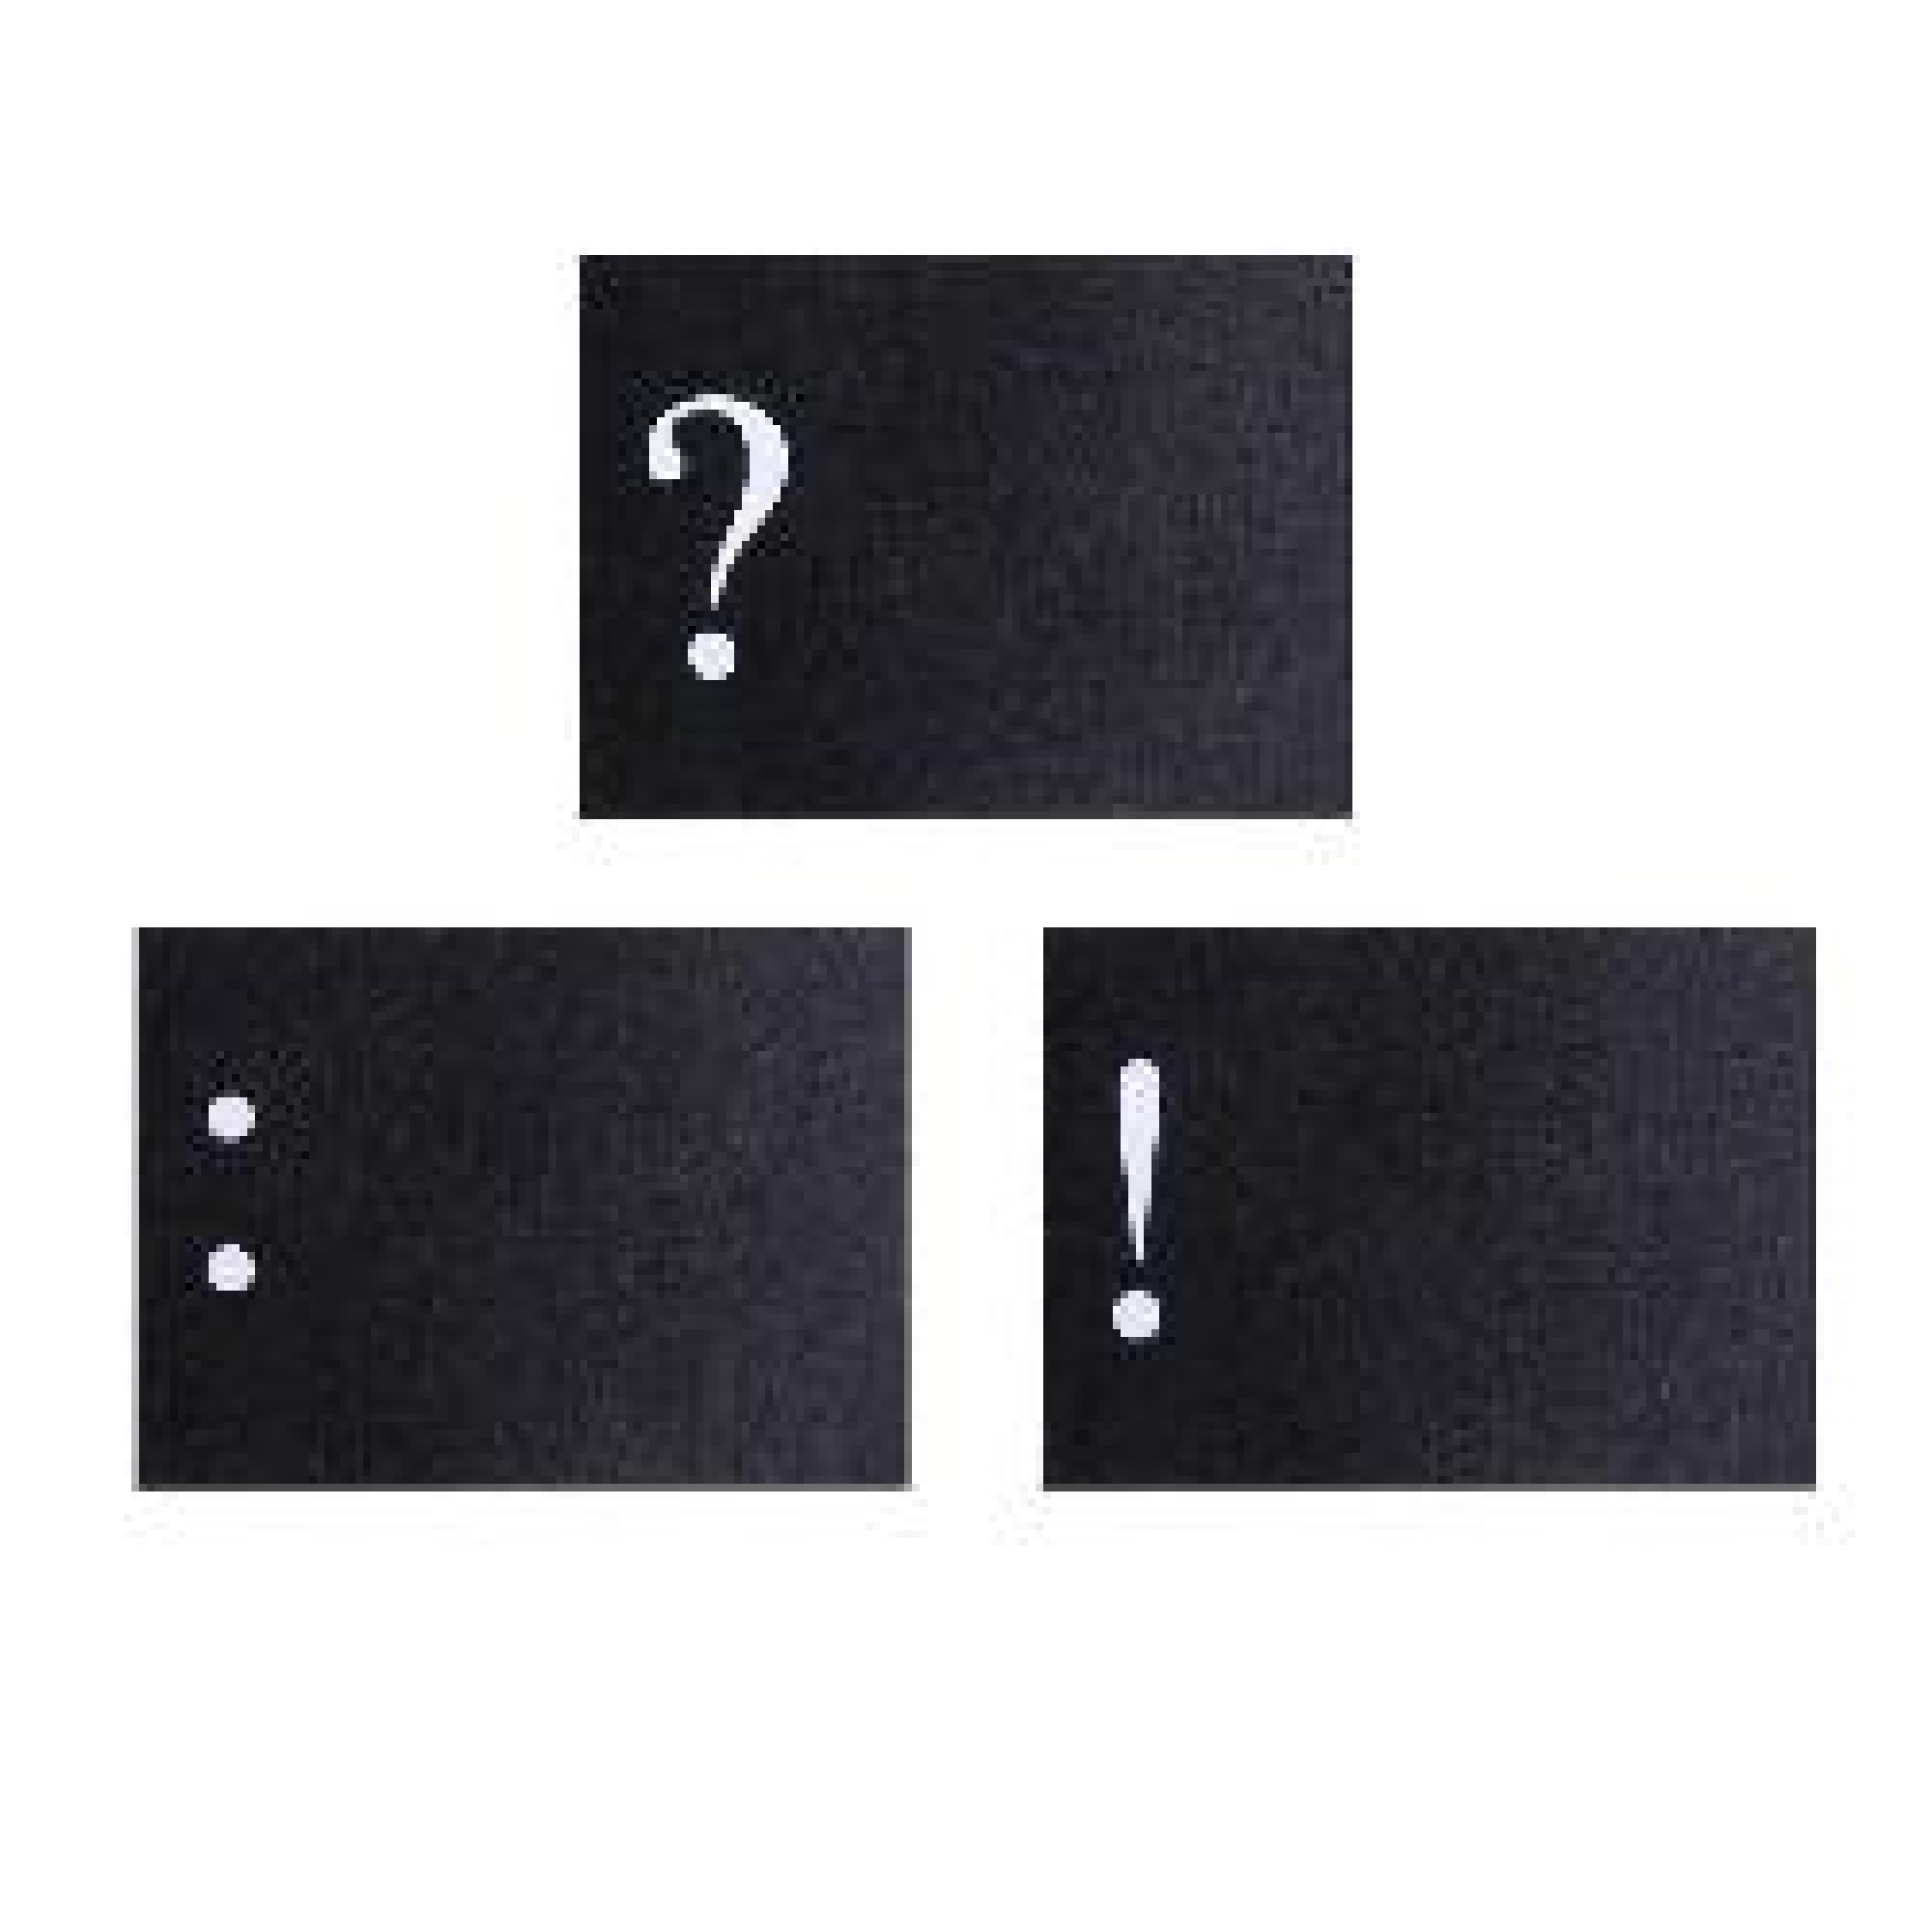 Ikea tenerife detalles producto - Pizarra imantada ikea ...